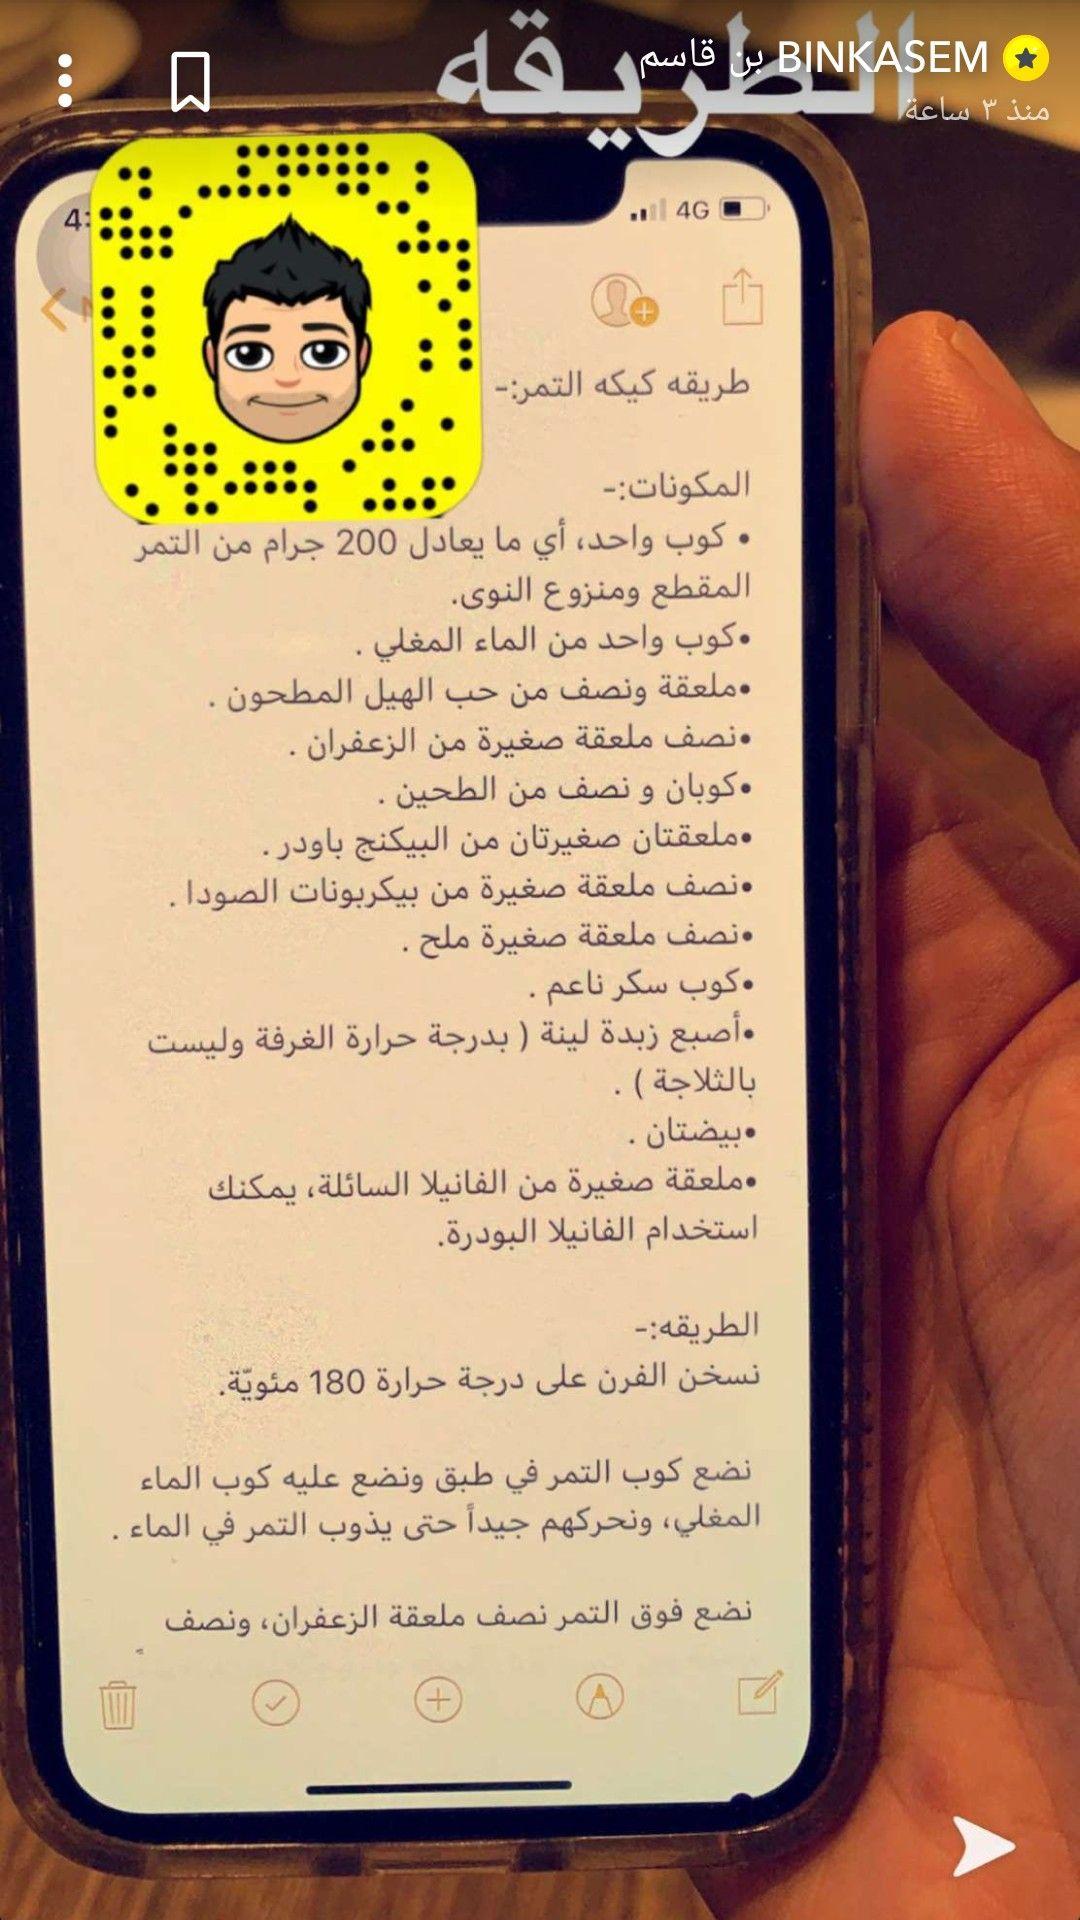 Pin By Raneem On مطبخ حلا كيك Arabic Food Recipes Food And Drink